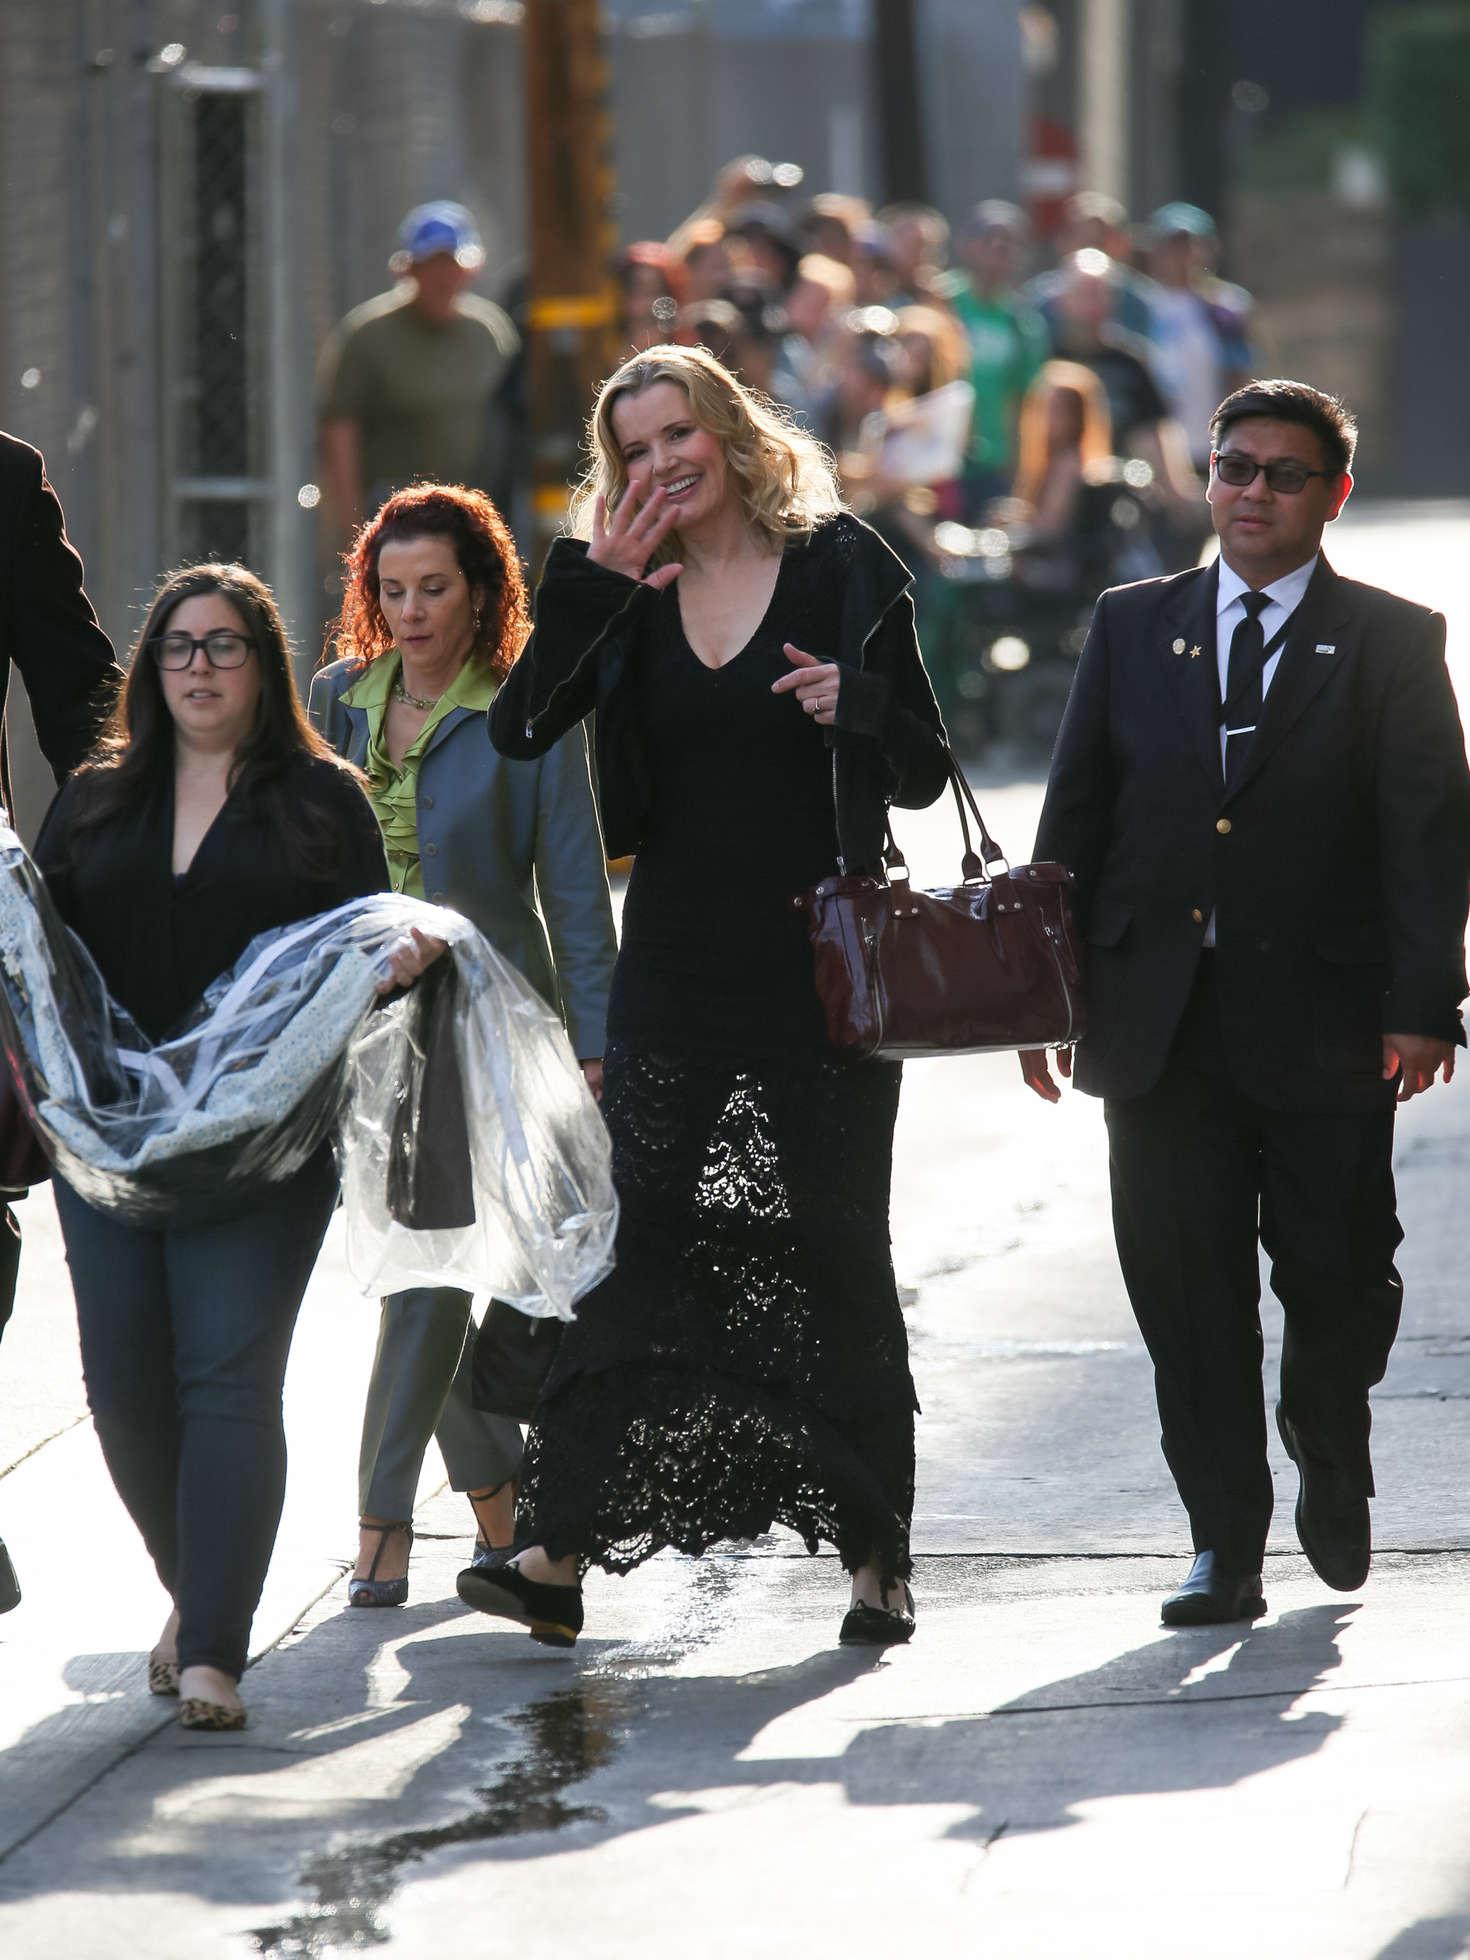 Geena Davis Arriving at Jimmy Kimmel Live in Los Angeles